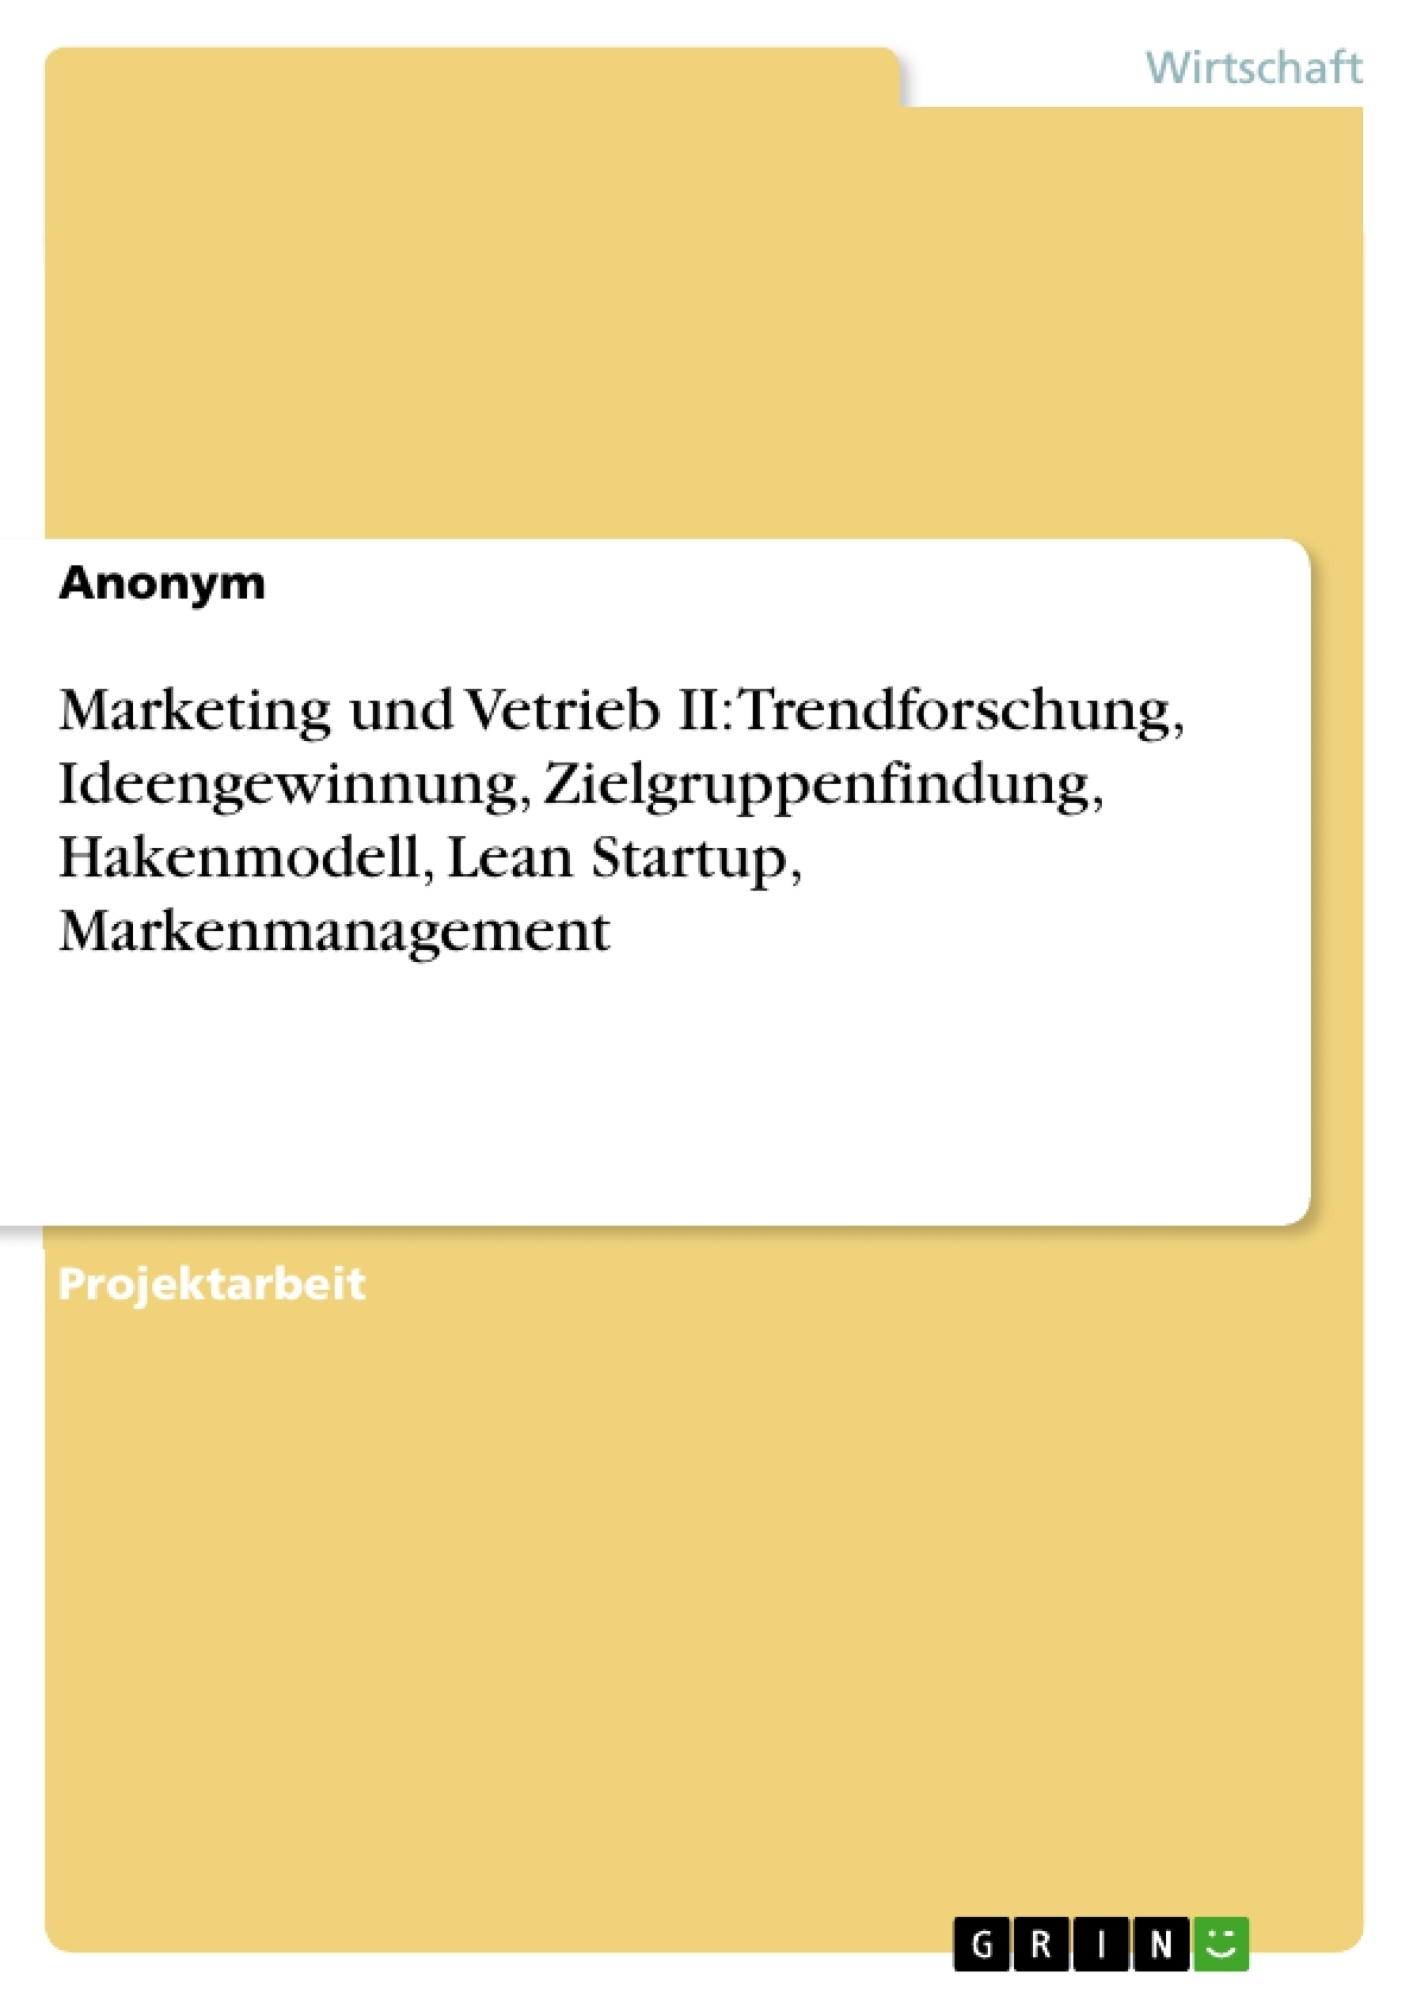 Title: Marketing und Vetrieb II: Trendforschung, Ideengewinnung, Zielgruppenfindung, Hakenmodell, Lean Startup, Markenmanagement